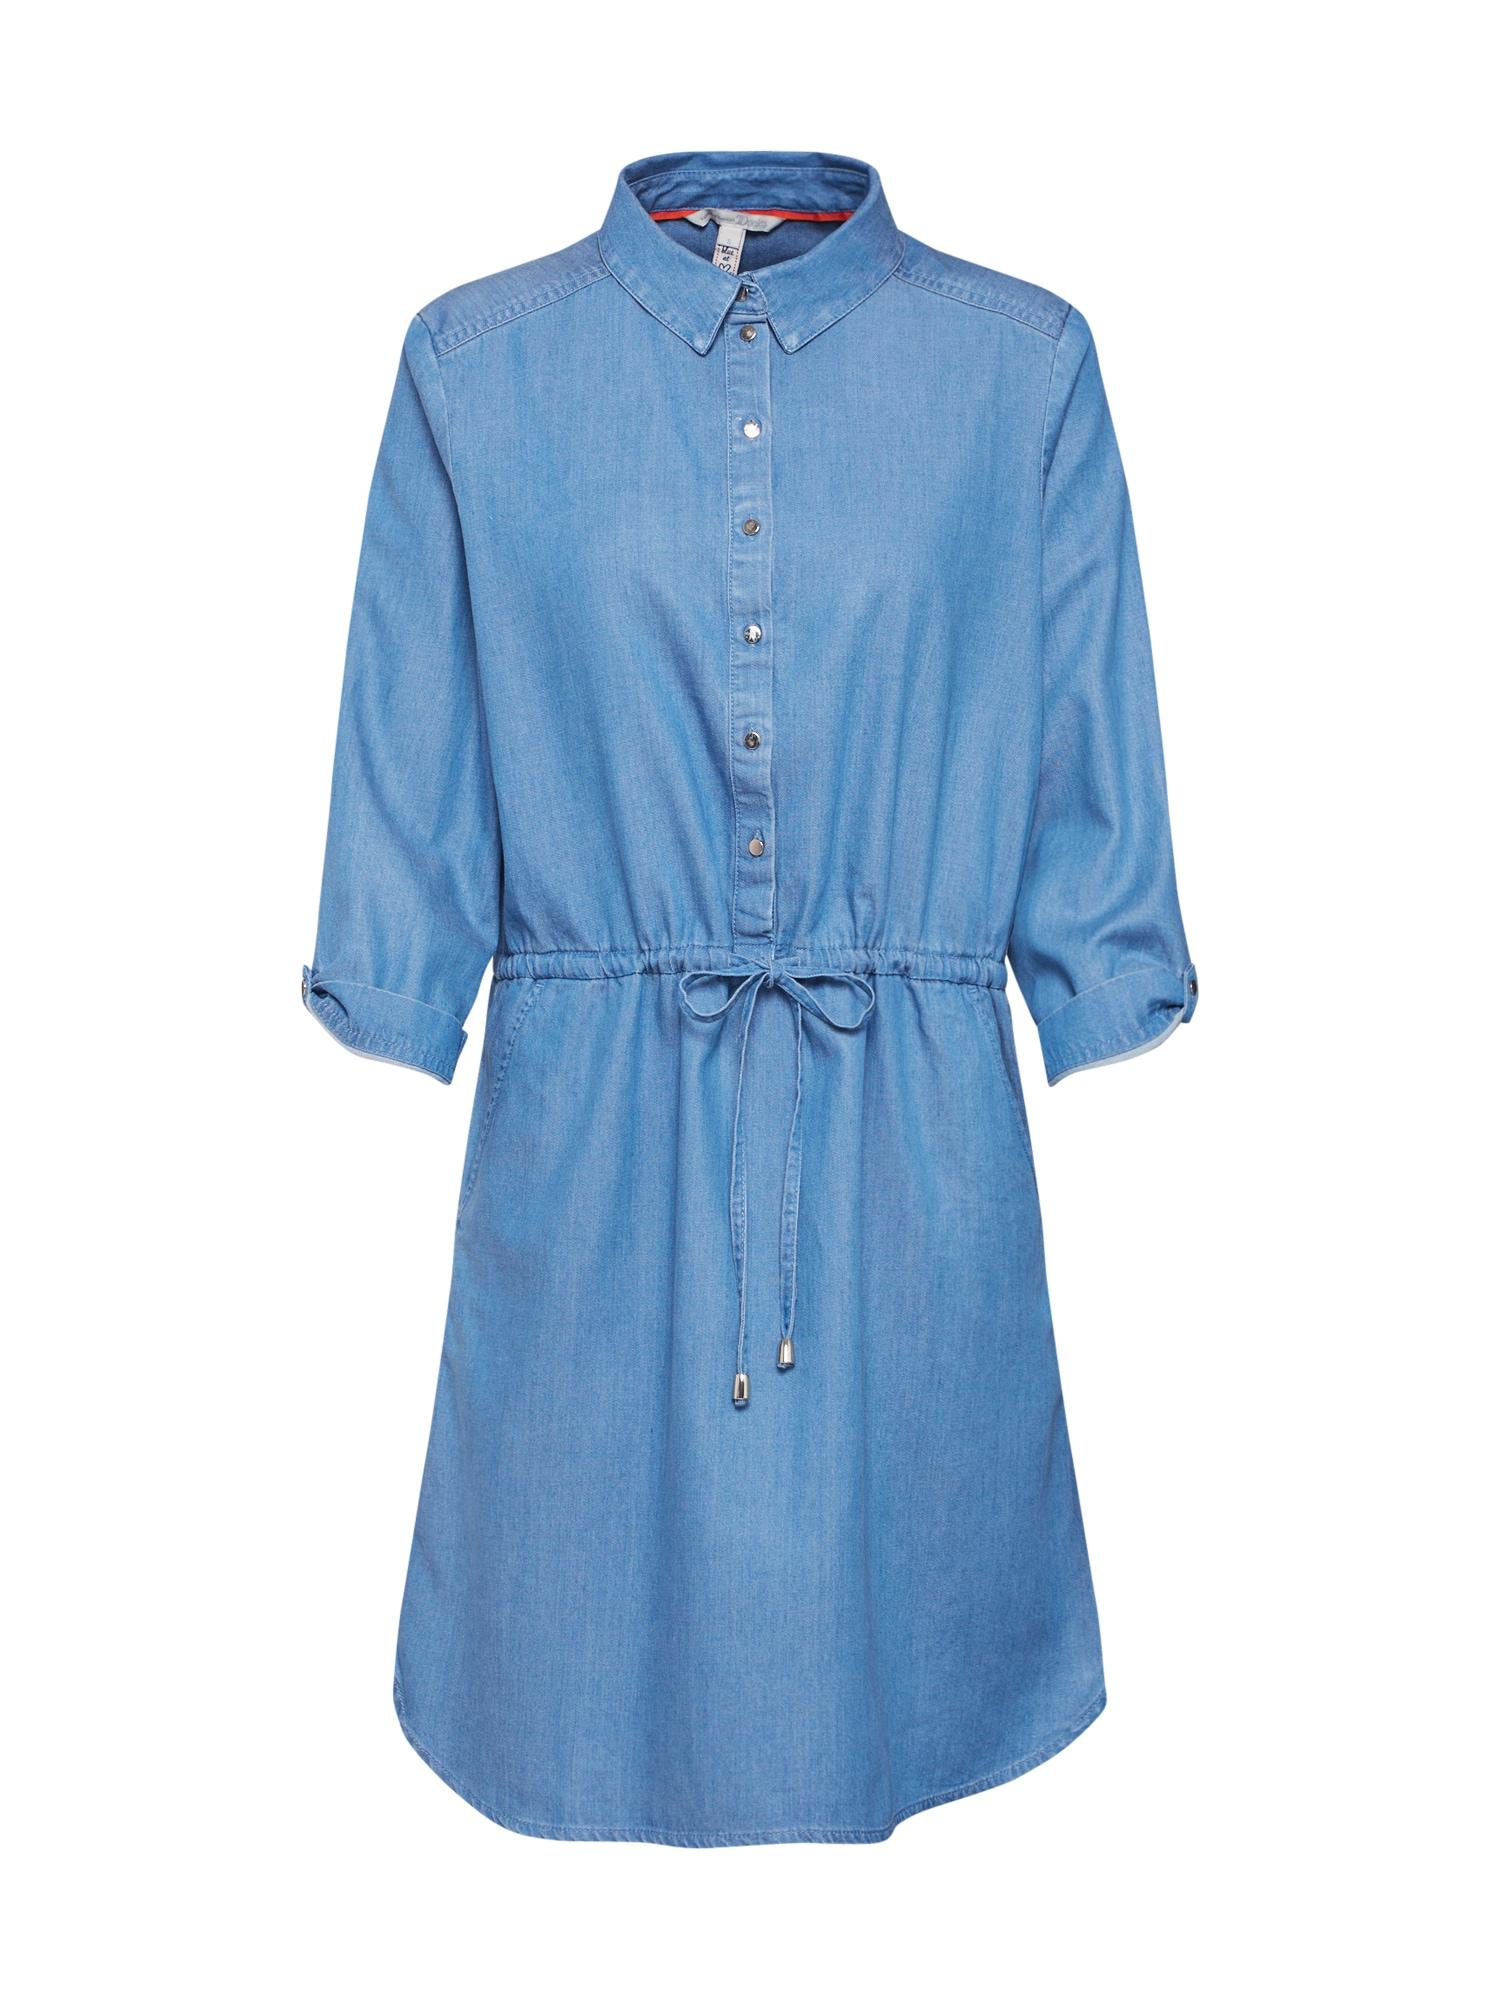 TOM TAILOR DENIM Rochie tip bluză  denim albastru